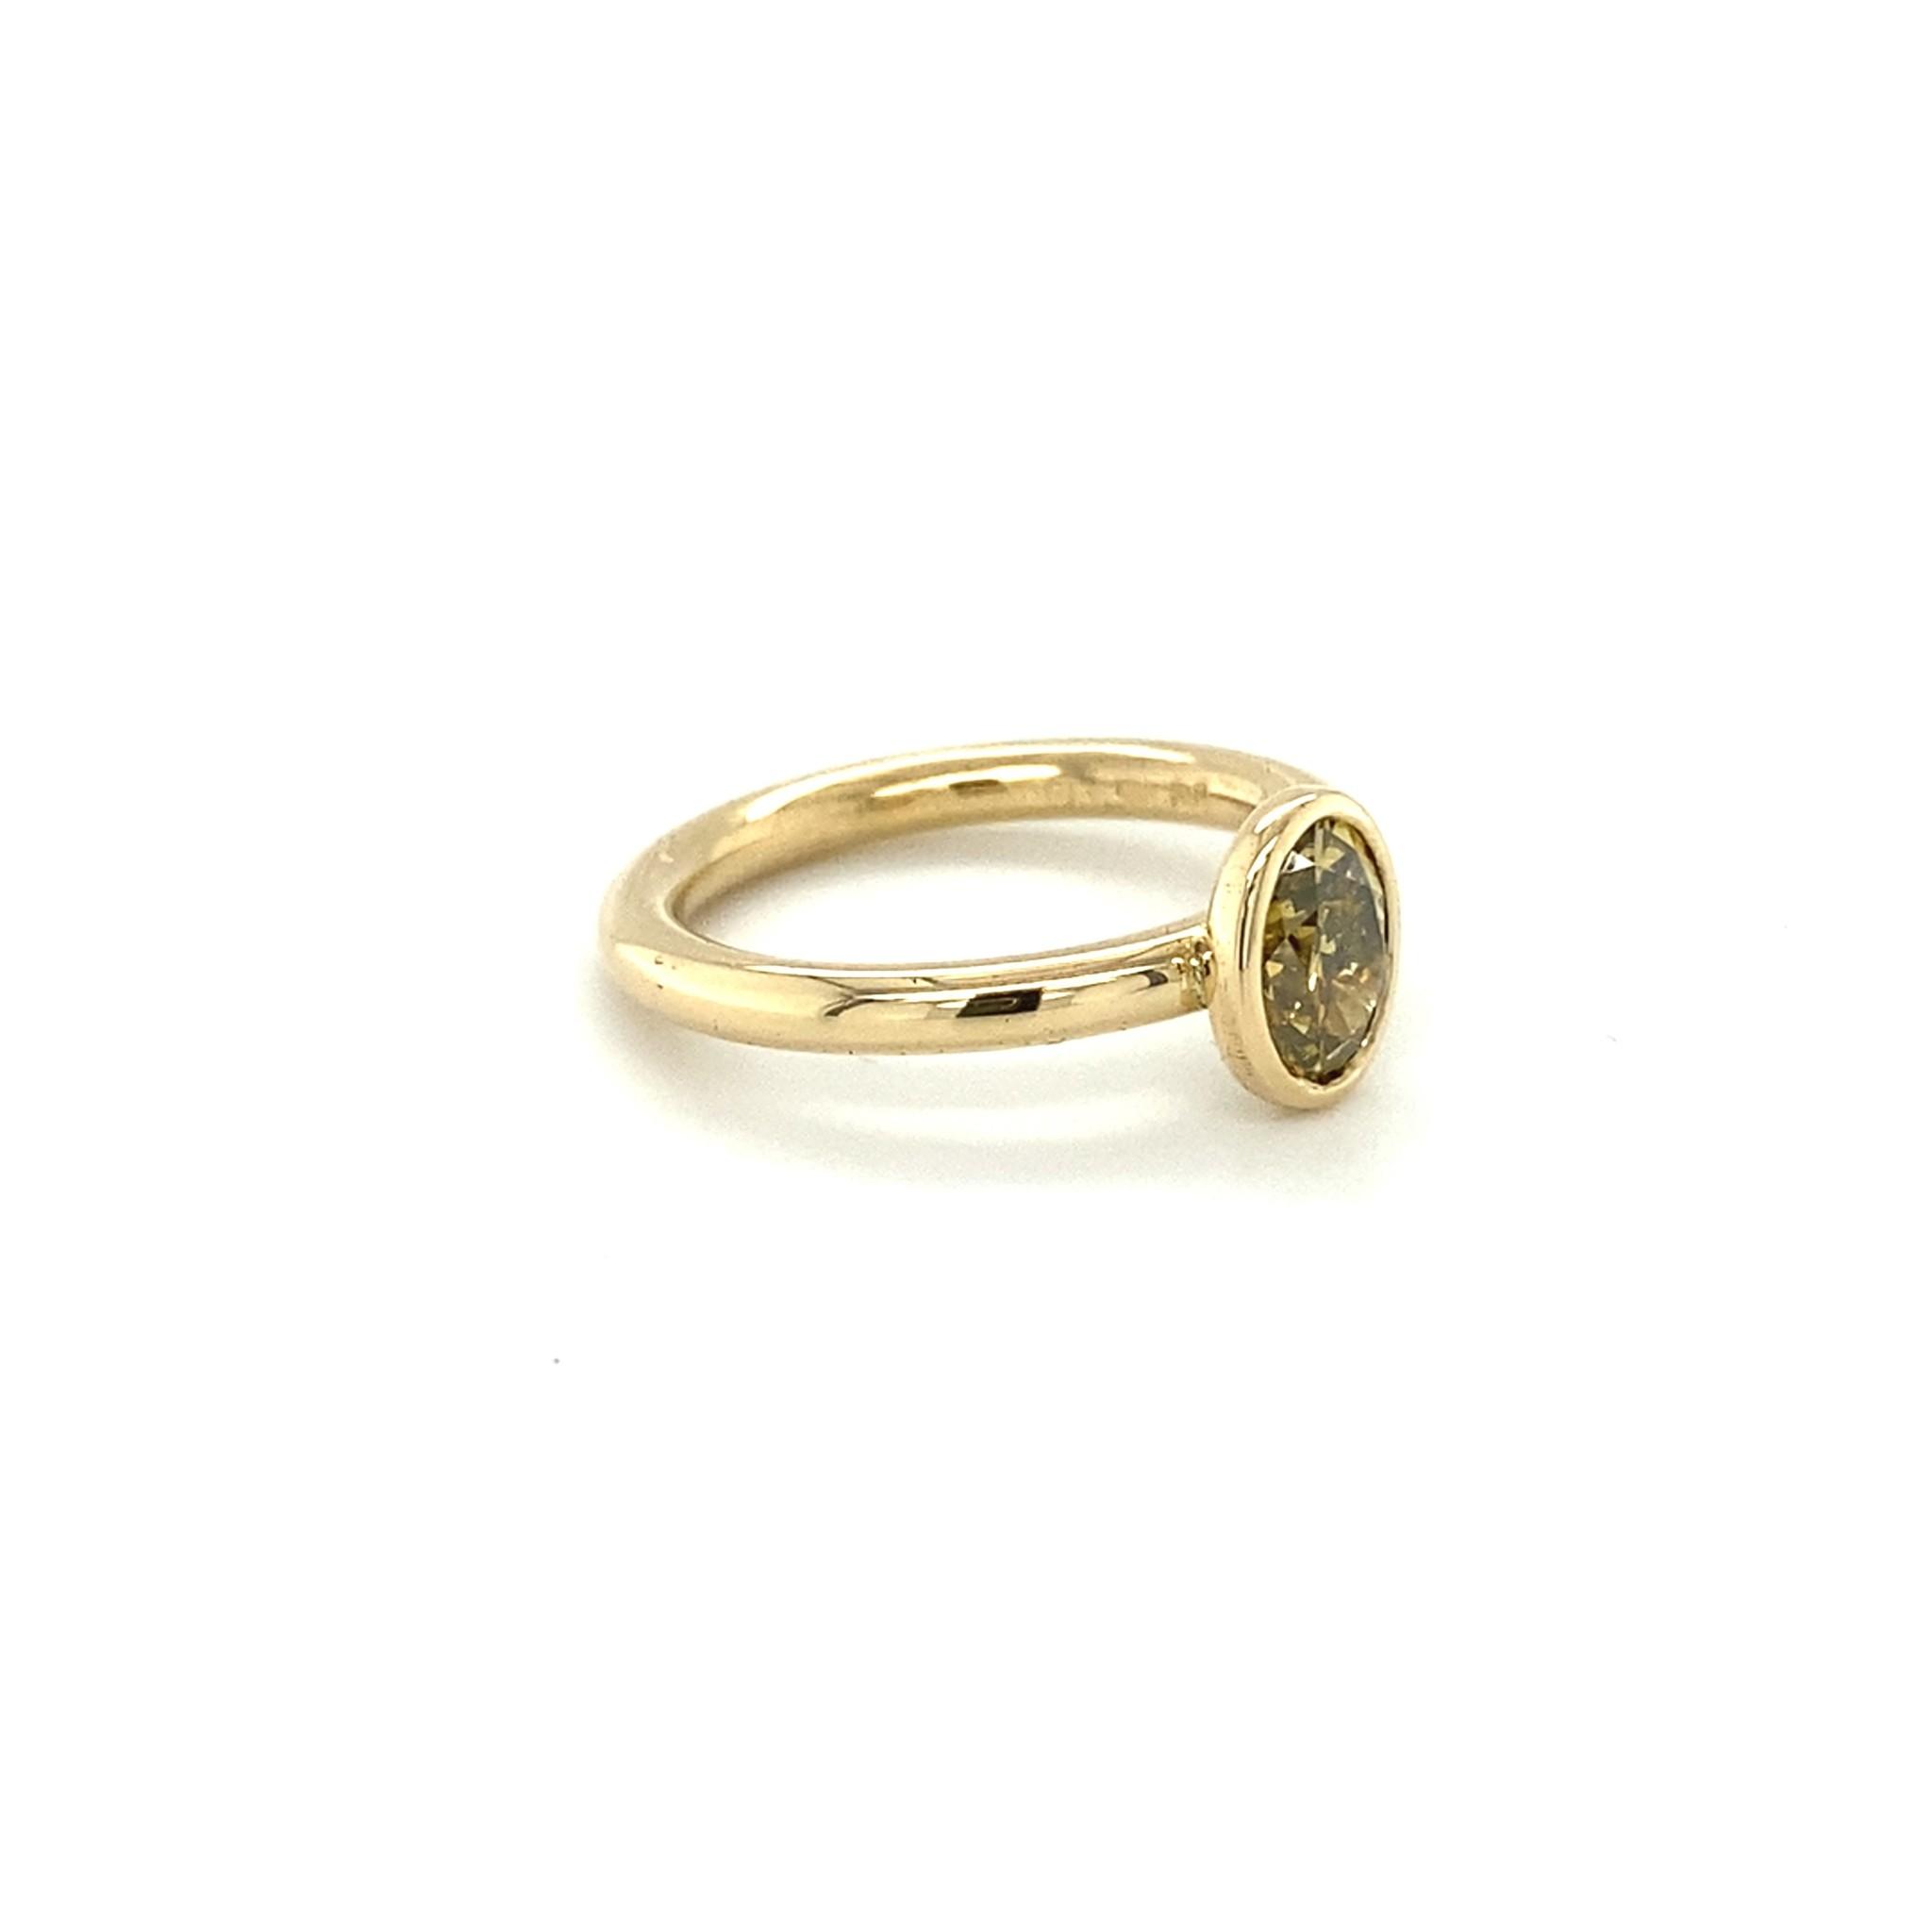 ROEMER by Bregje ROEMER by Bregje geelgouden ring met ovale diamant